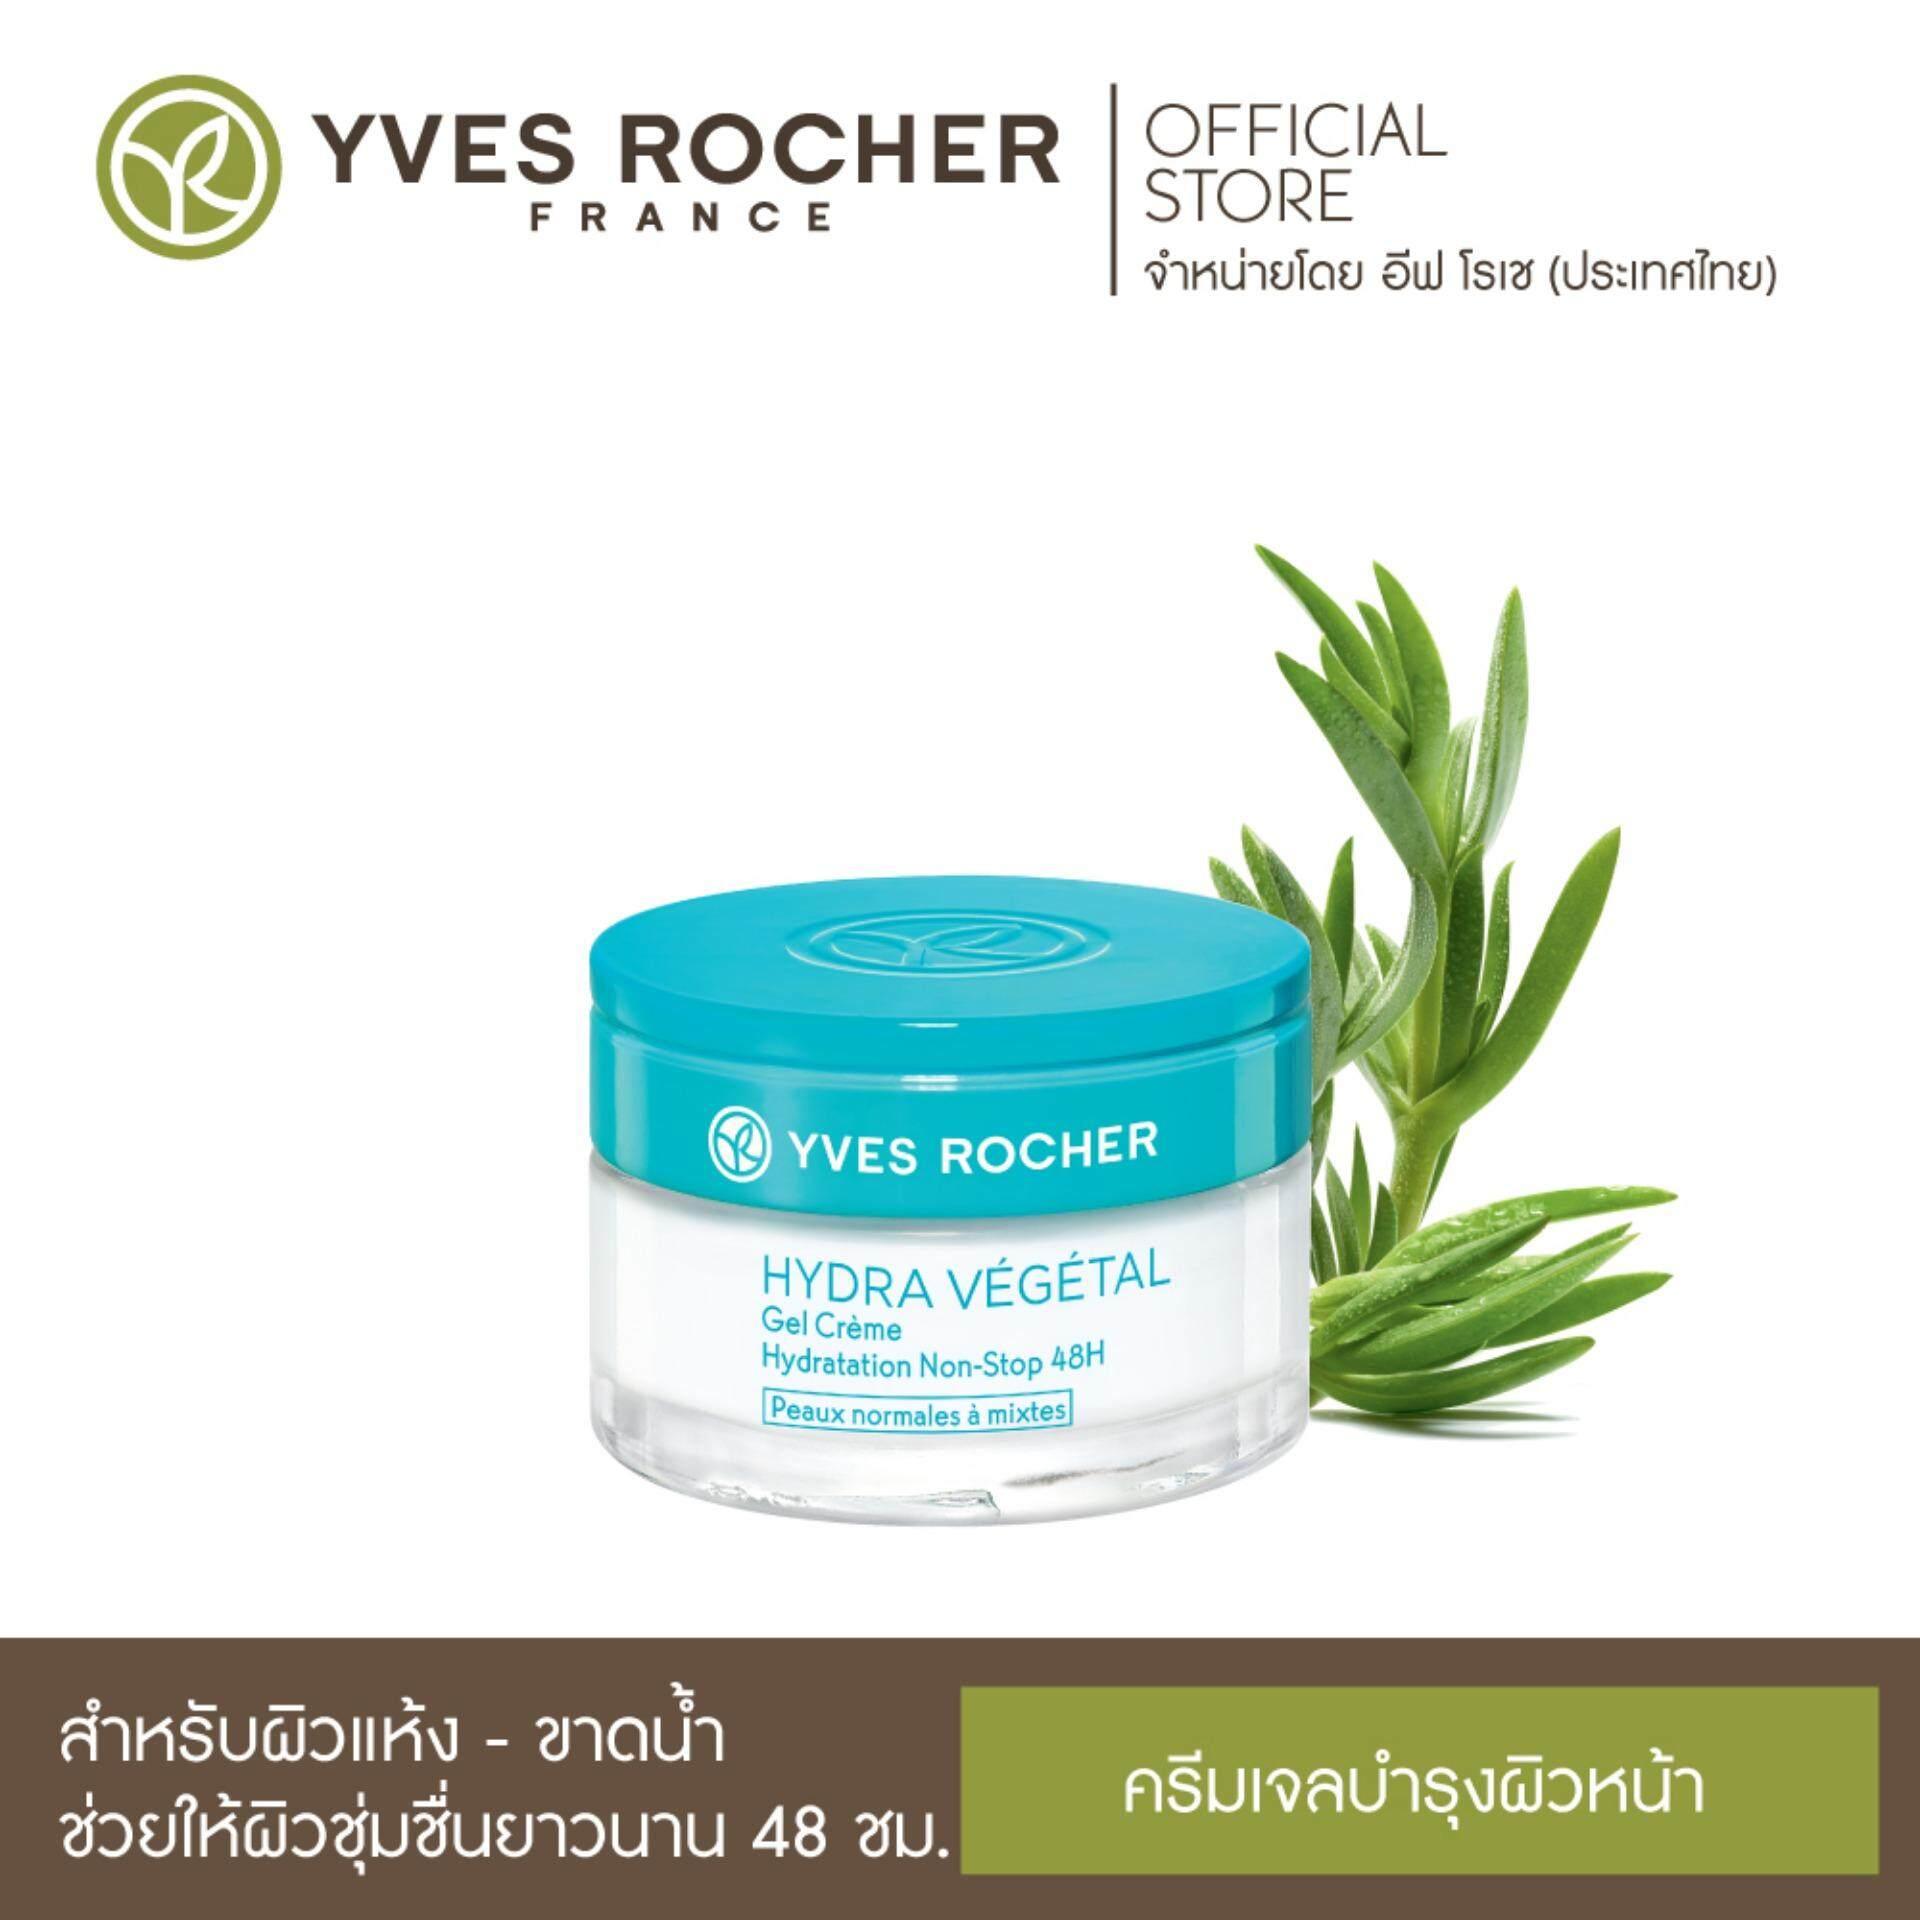 Yves Rocher Hydra Vegetal V2 48H Non Stop Gel Cream50ml